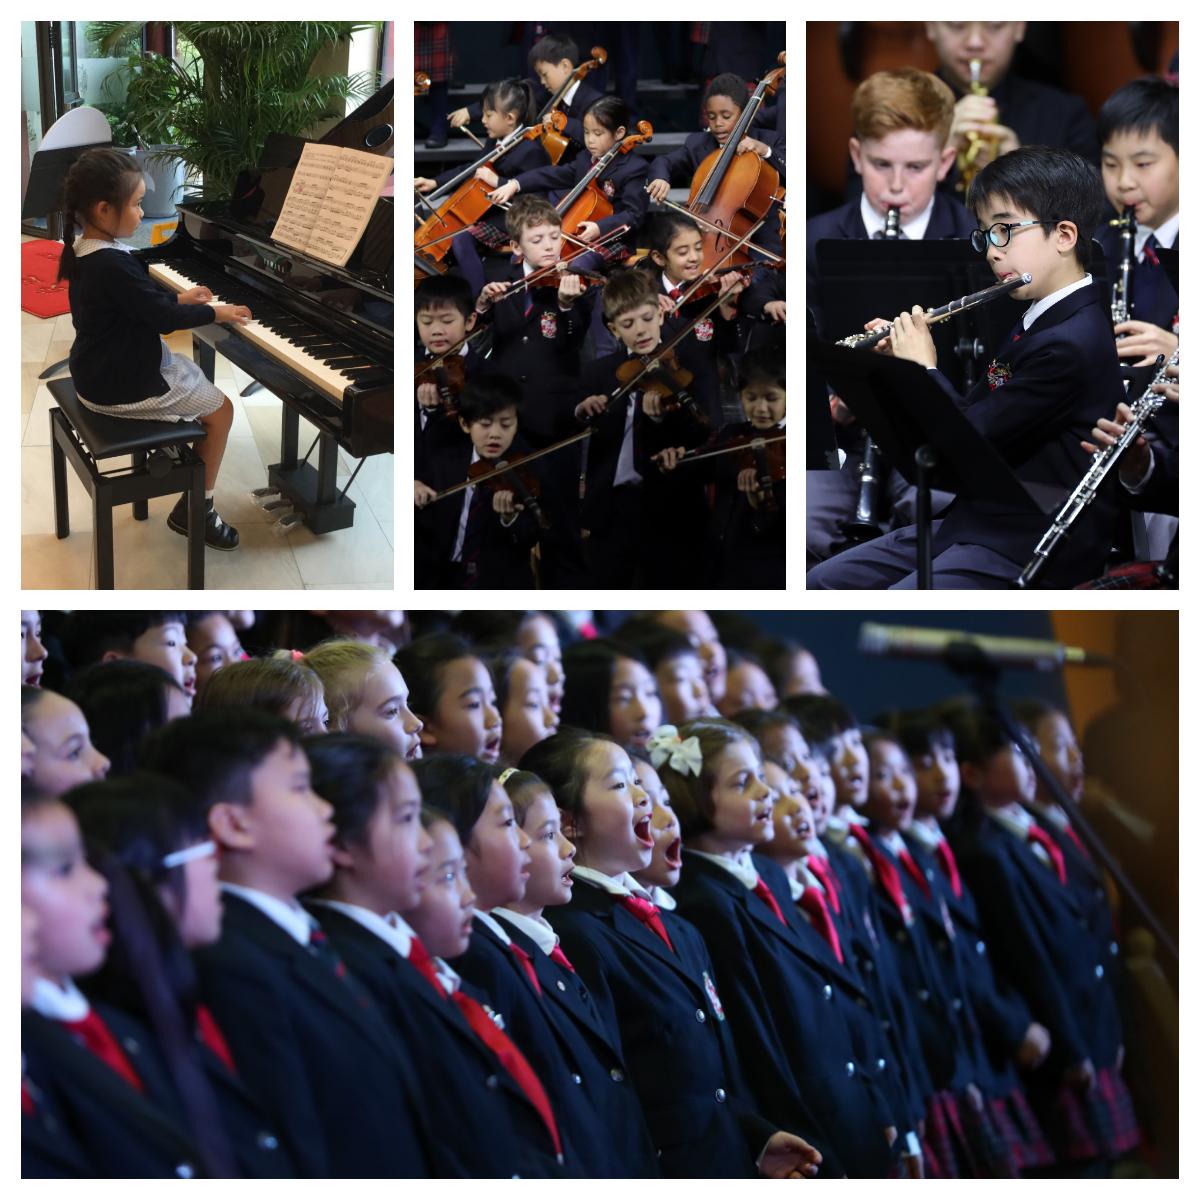 fotojet-1-上海德威外籍人员子女学校(浦东)-20200225-161016-434